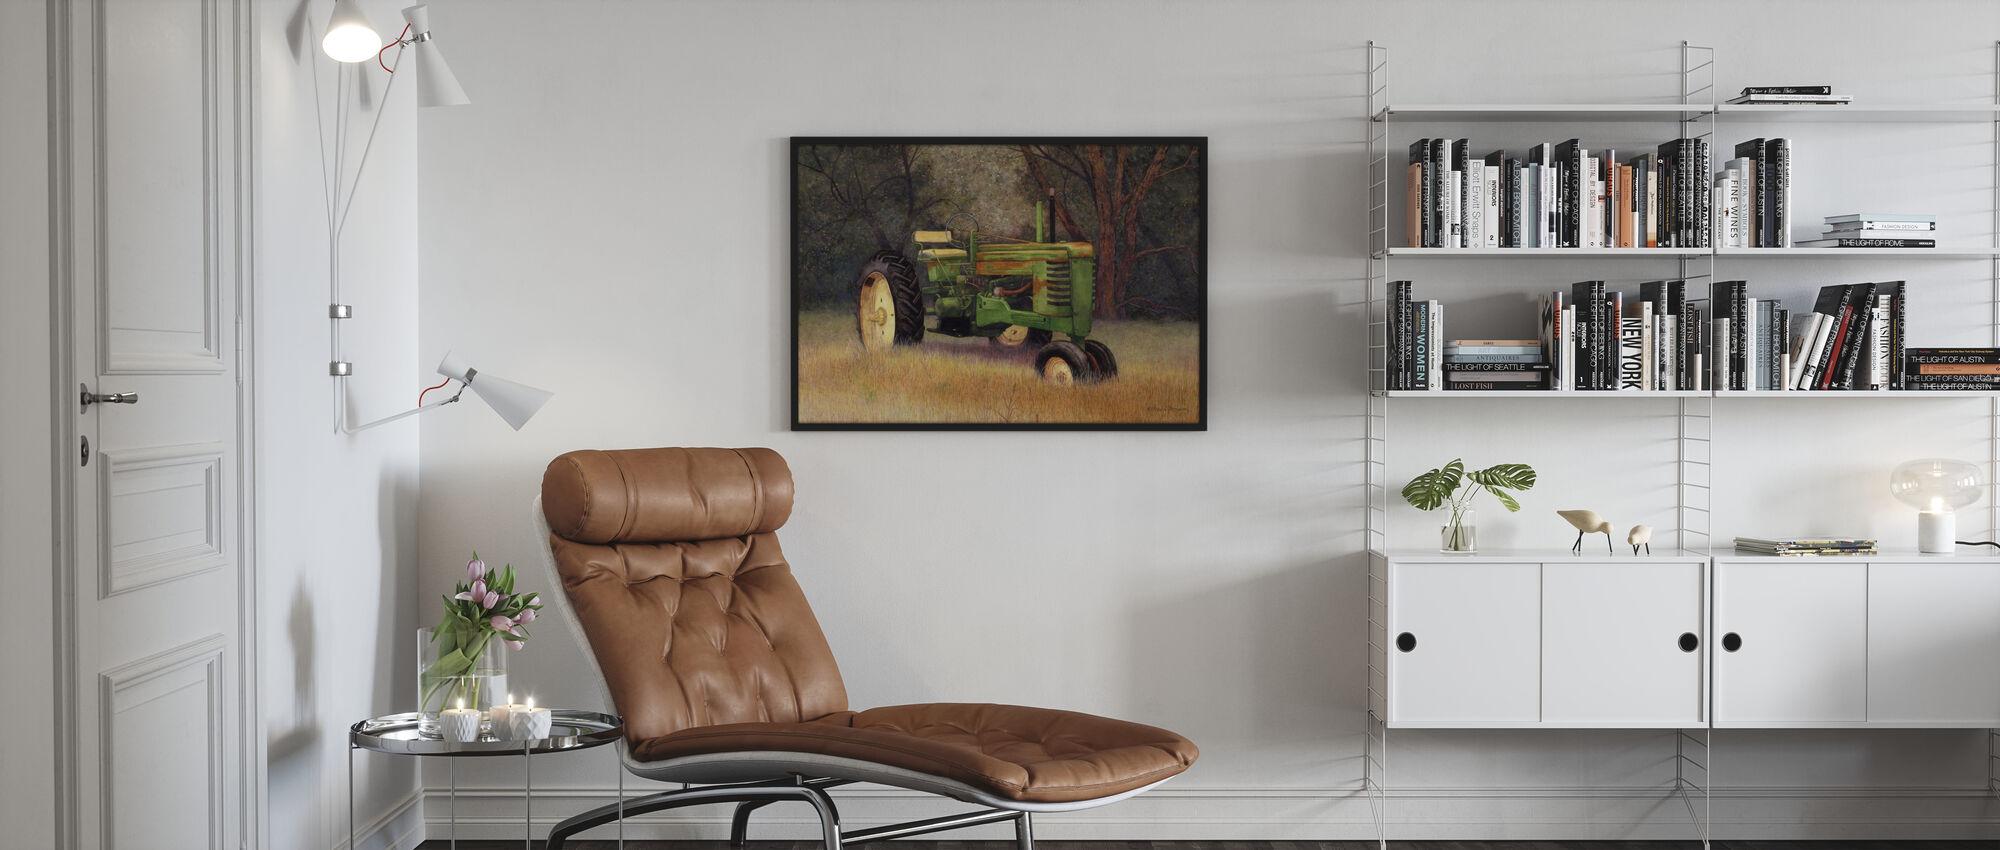 In Repose - Poster - Living Room